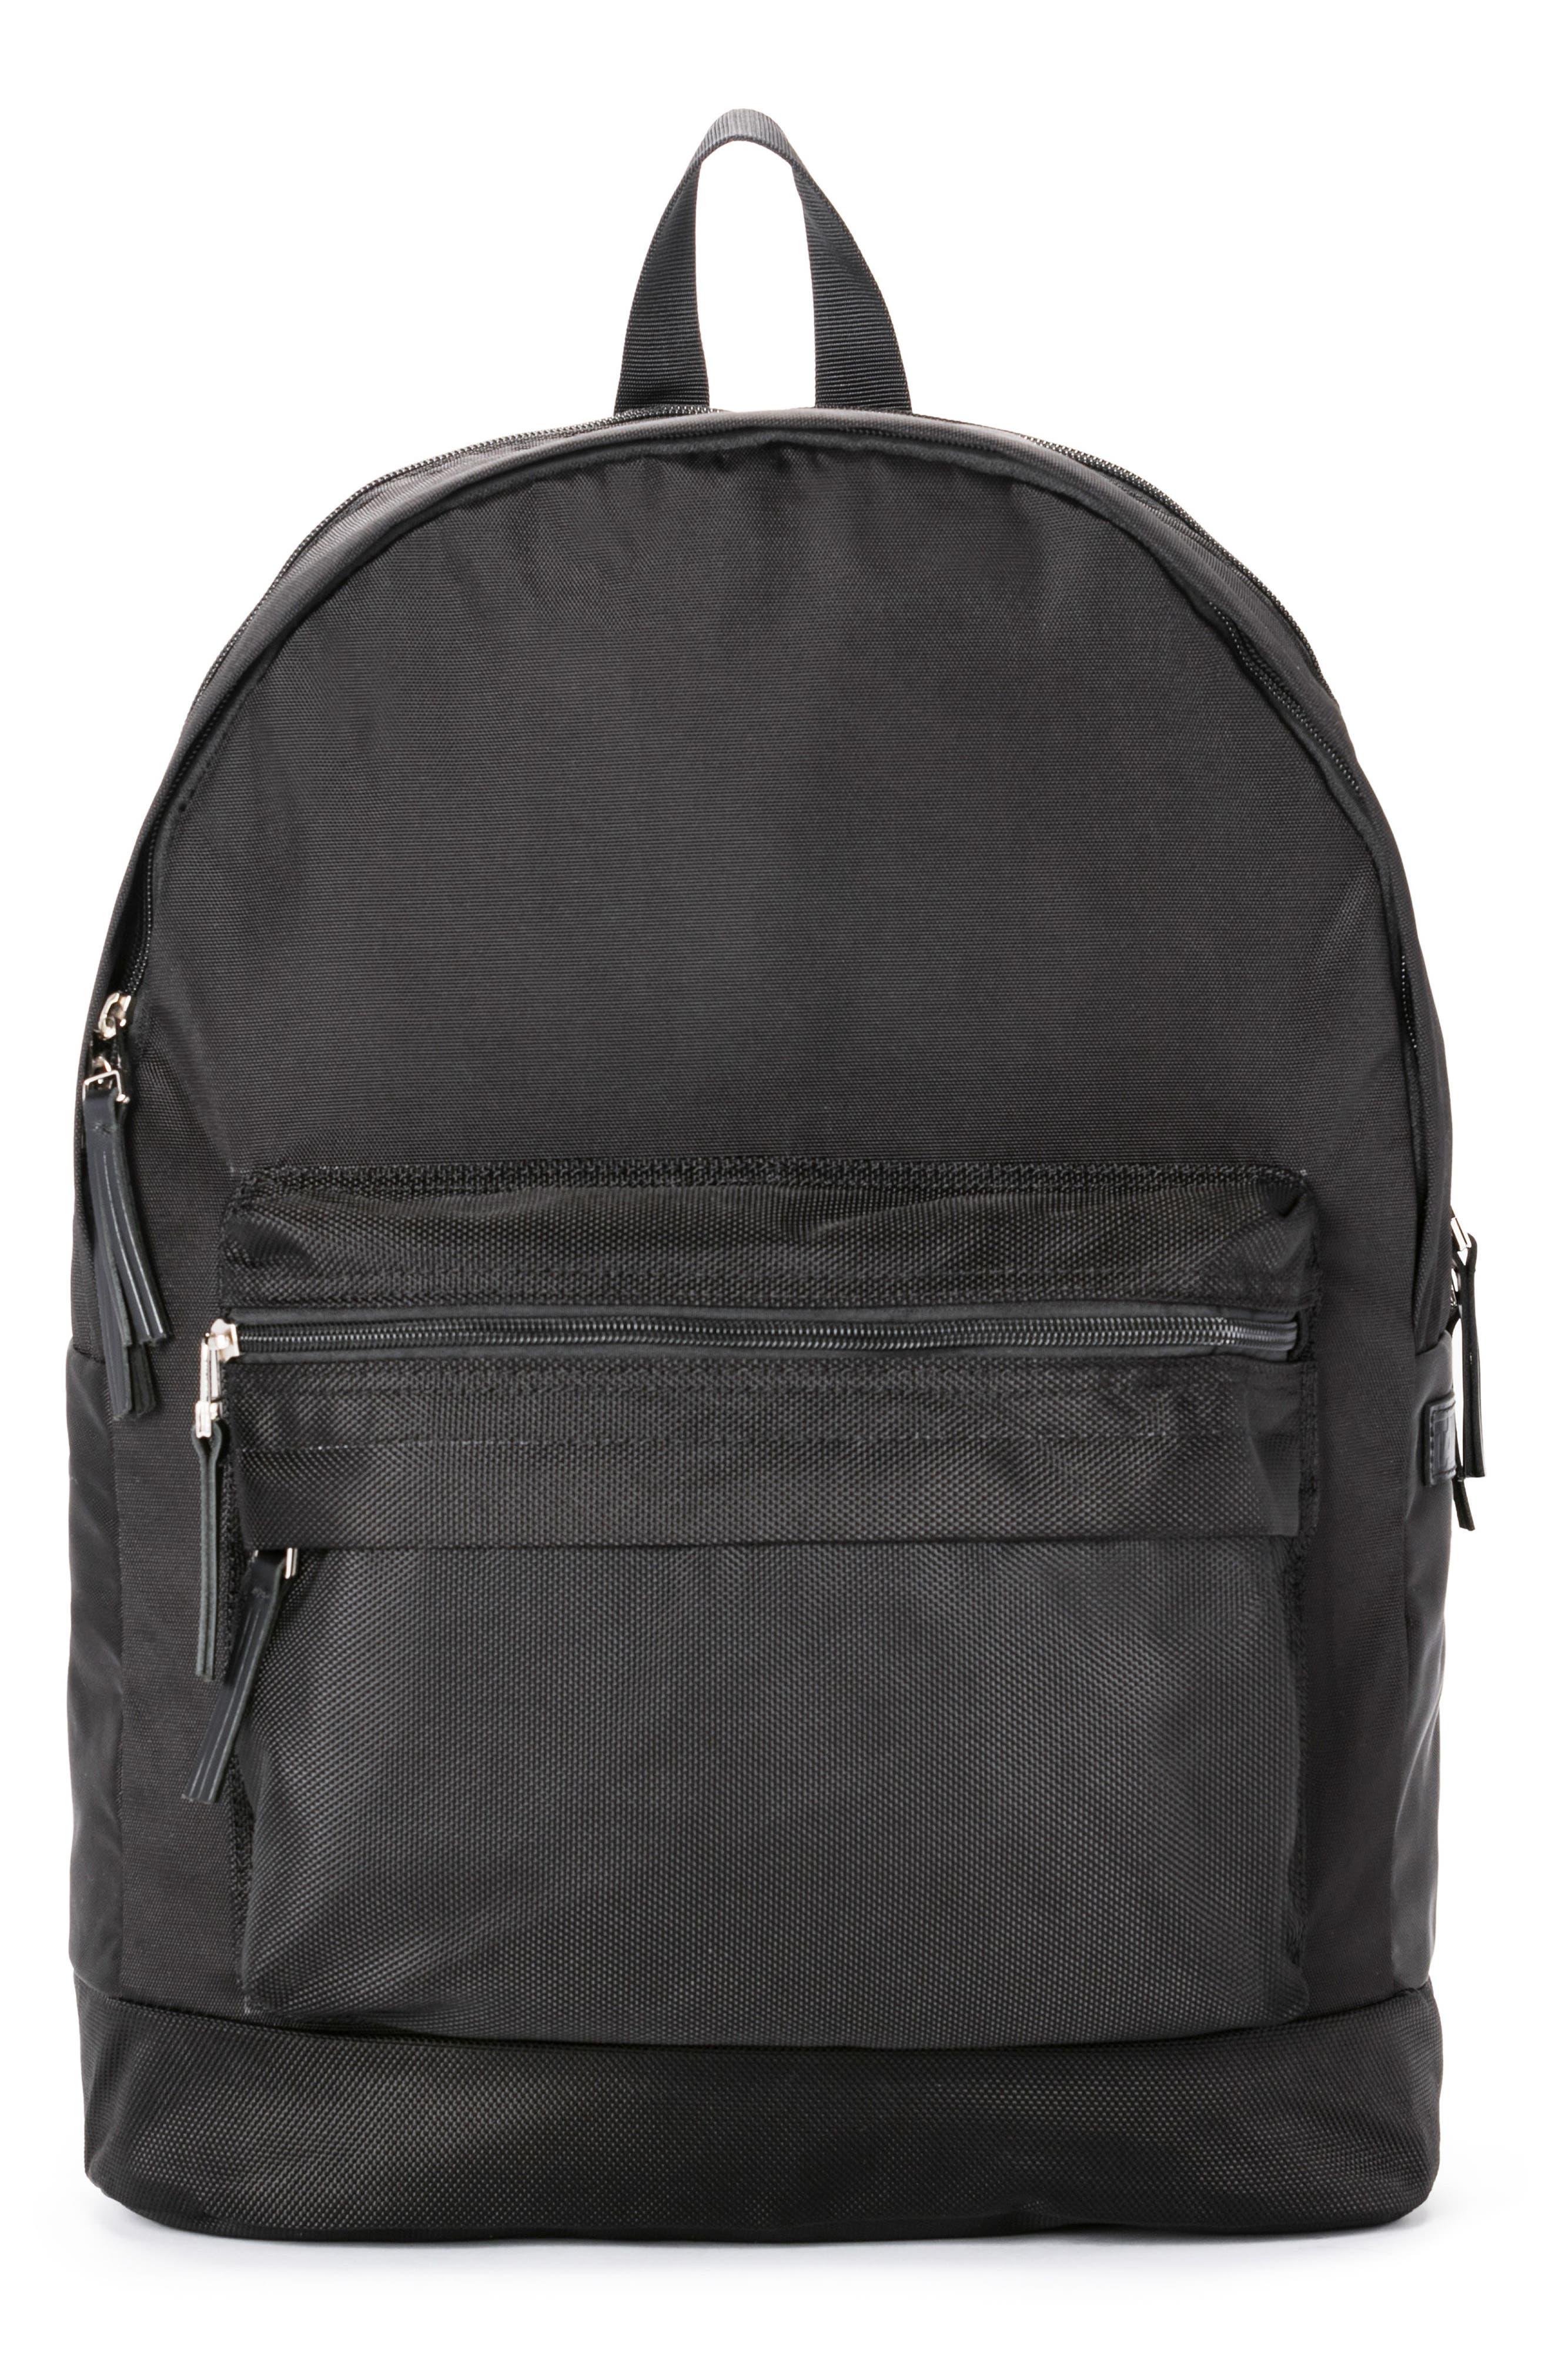 TAIKAN Lancer Backpack, Main, color, 001